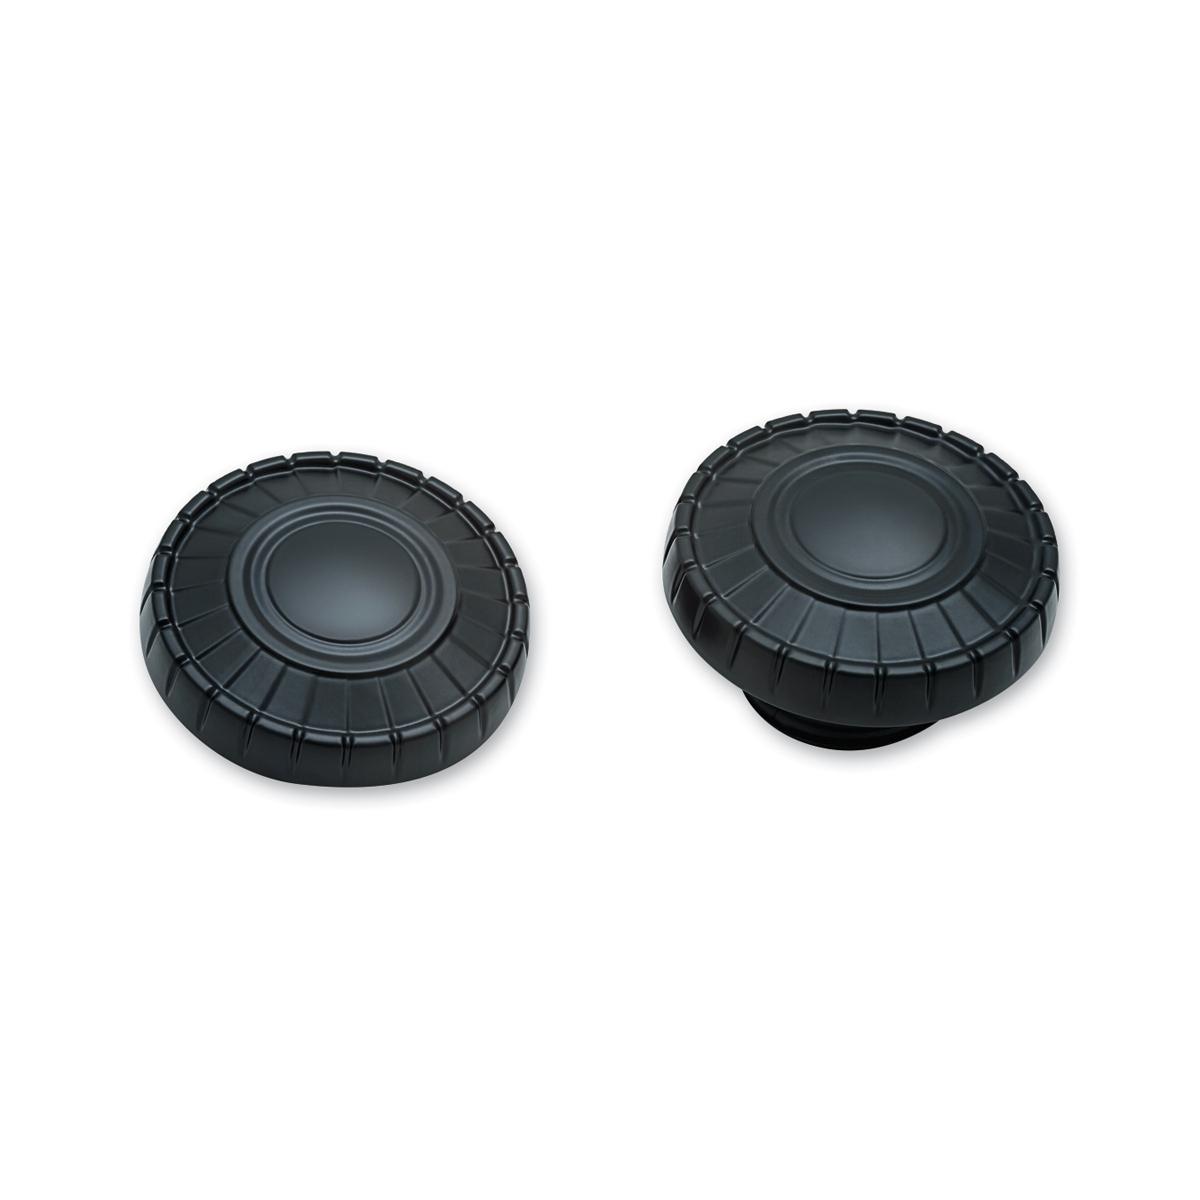 Kuryakyn Aztec Black Gas Caps